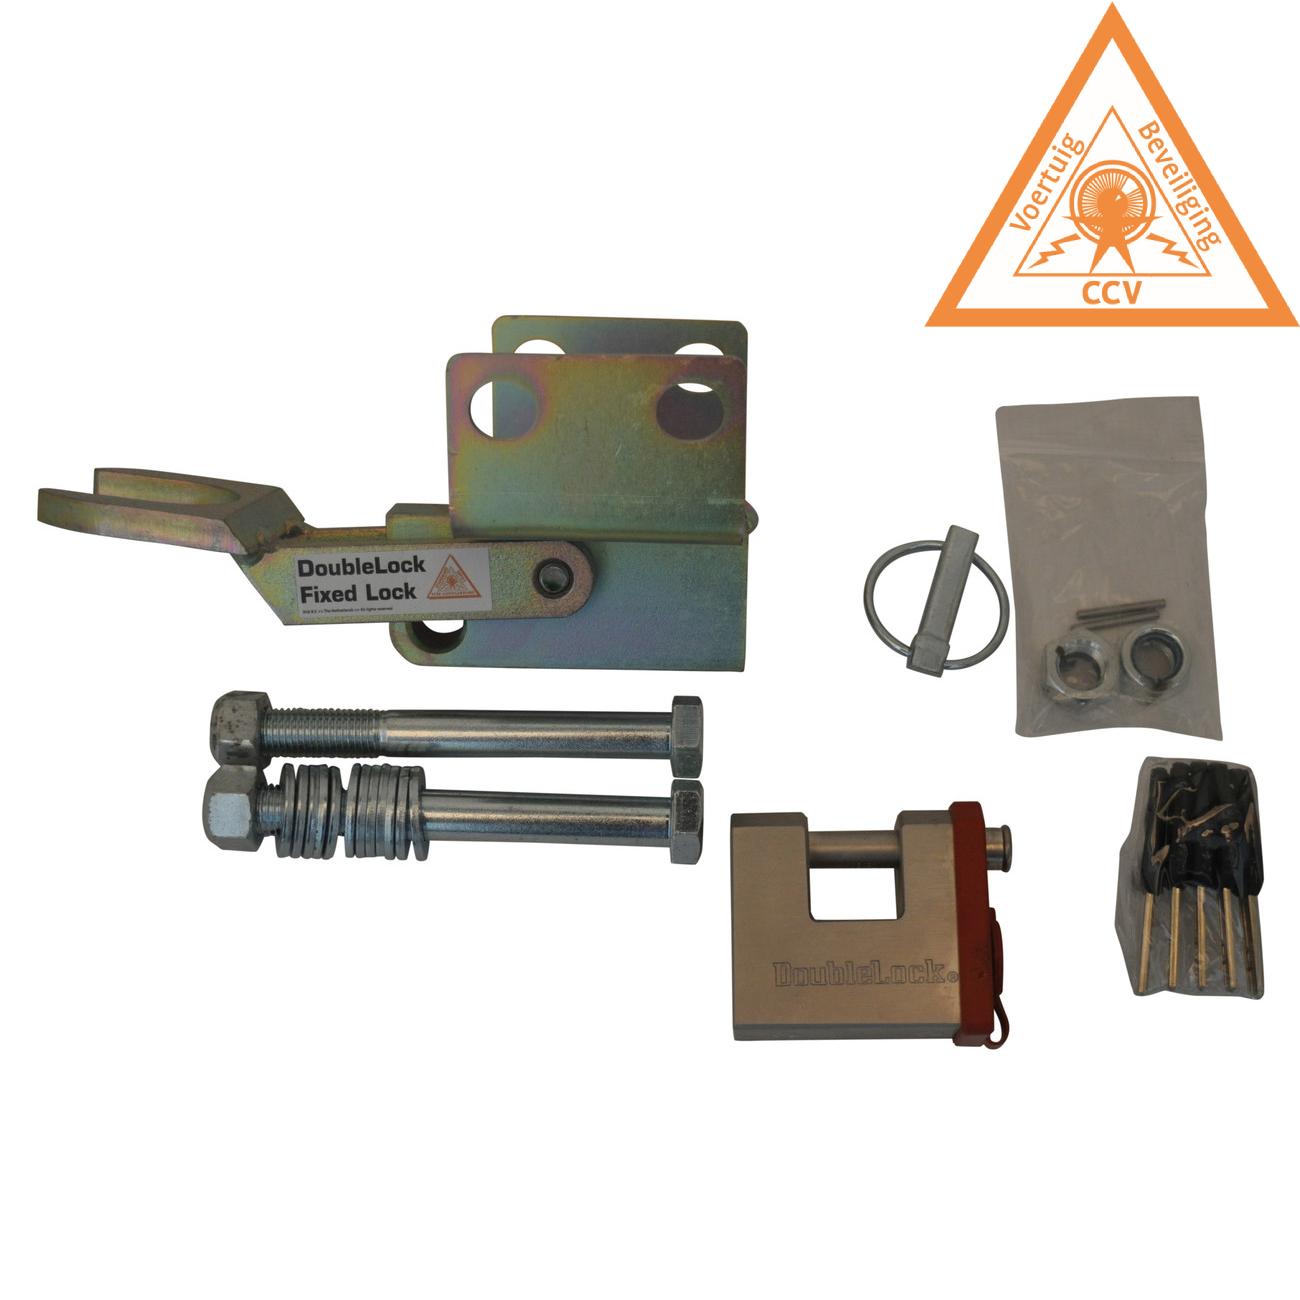 DoubleLock AK351 Fixed Lock - SCM gekeurd onderbouw disselslot voor de AL-KO AK351